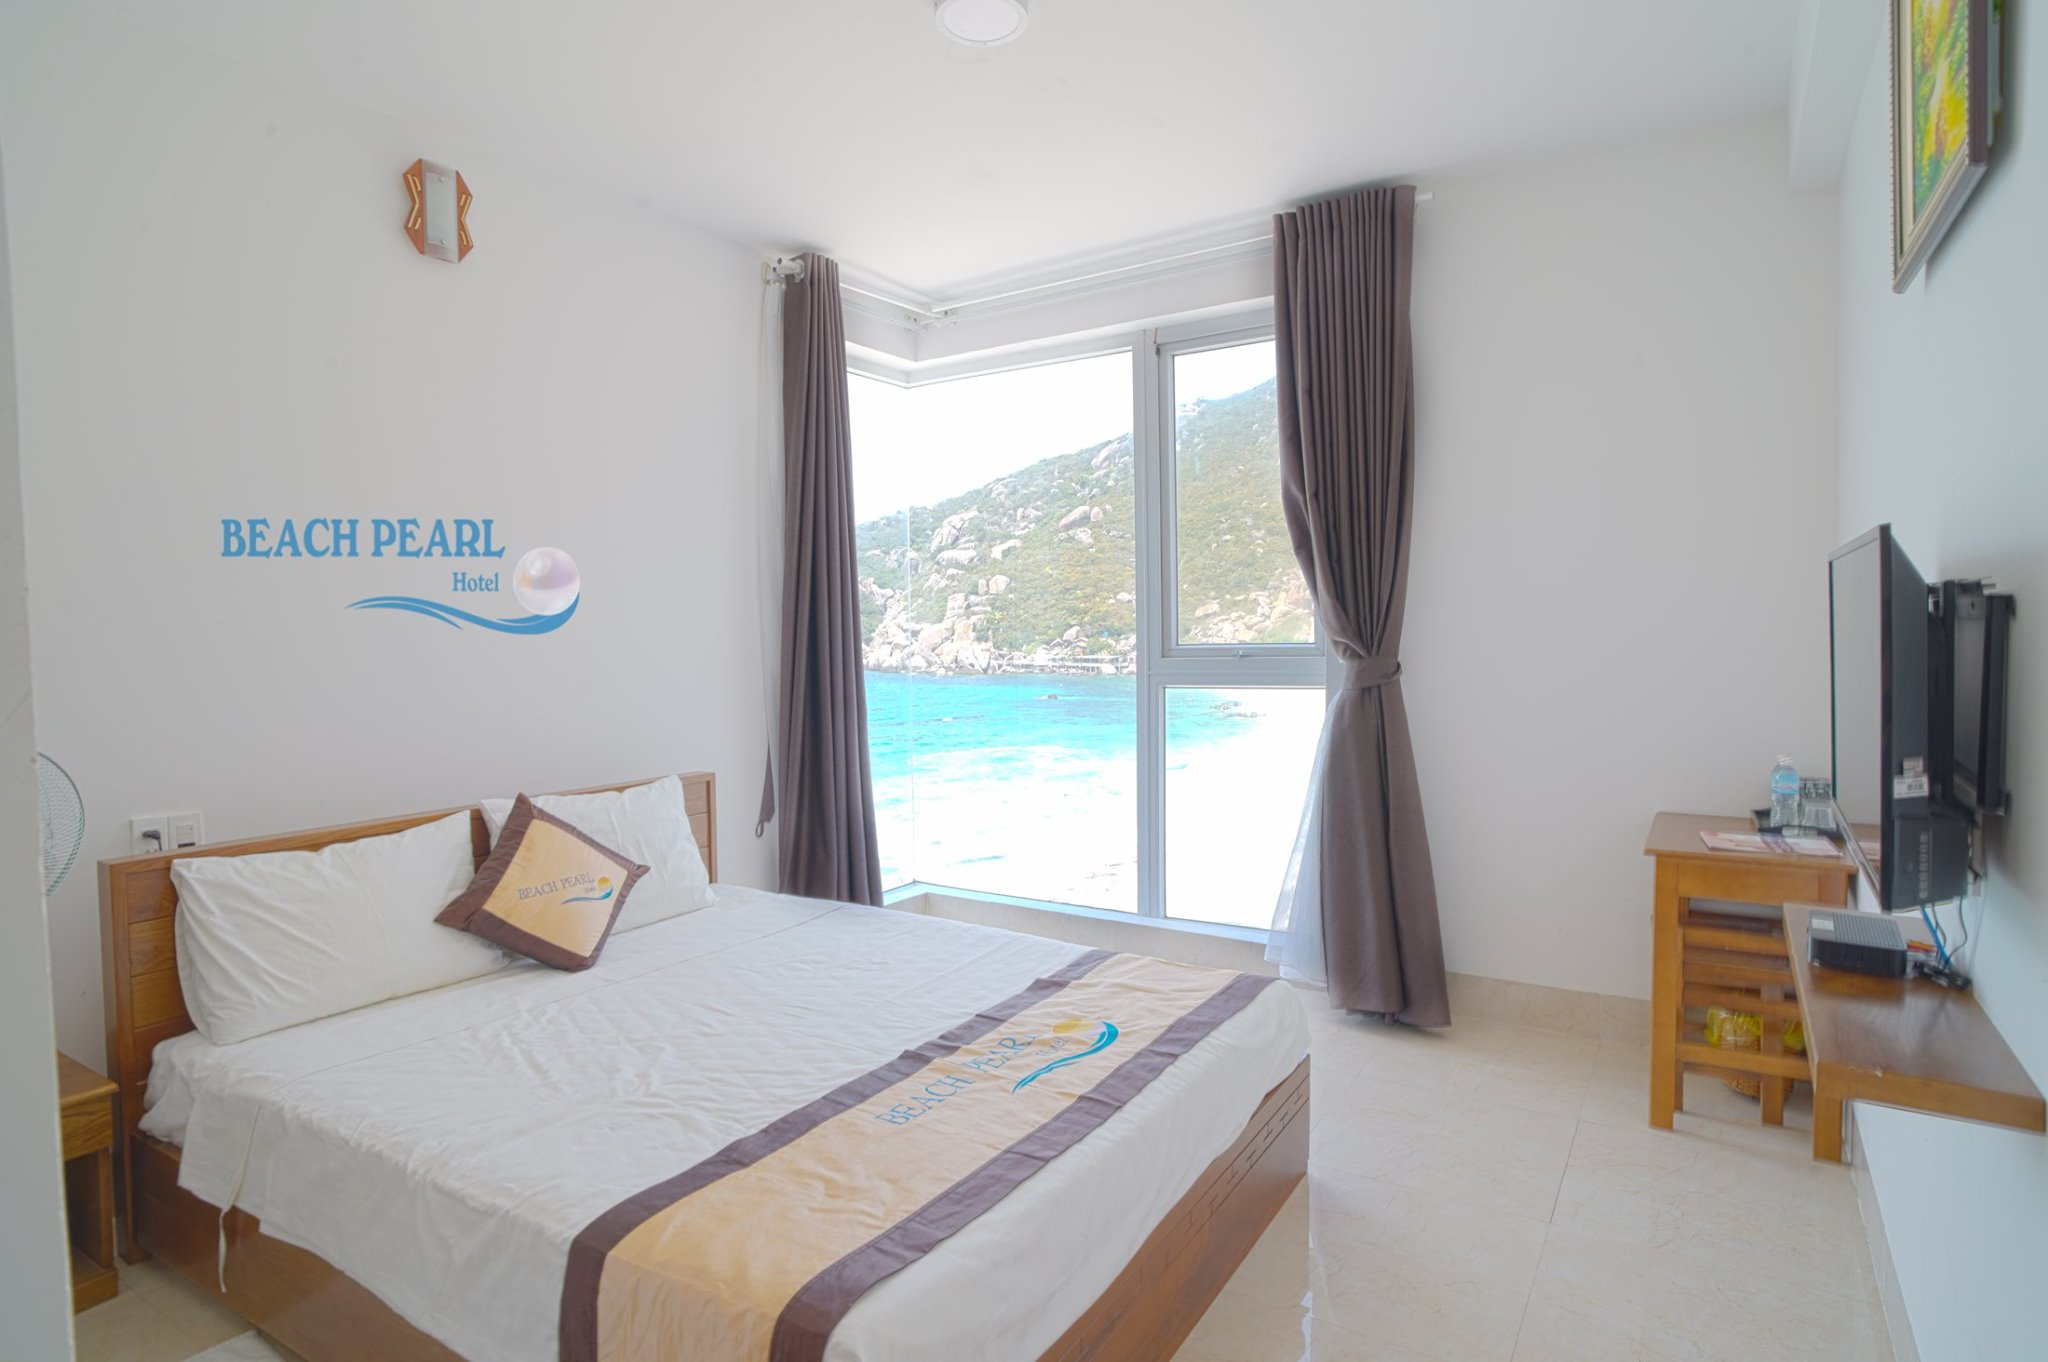 phong nghi tai beach pearl hotel